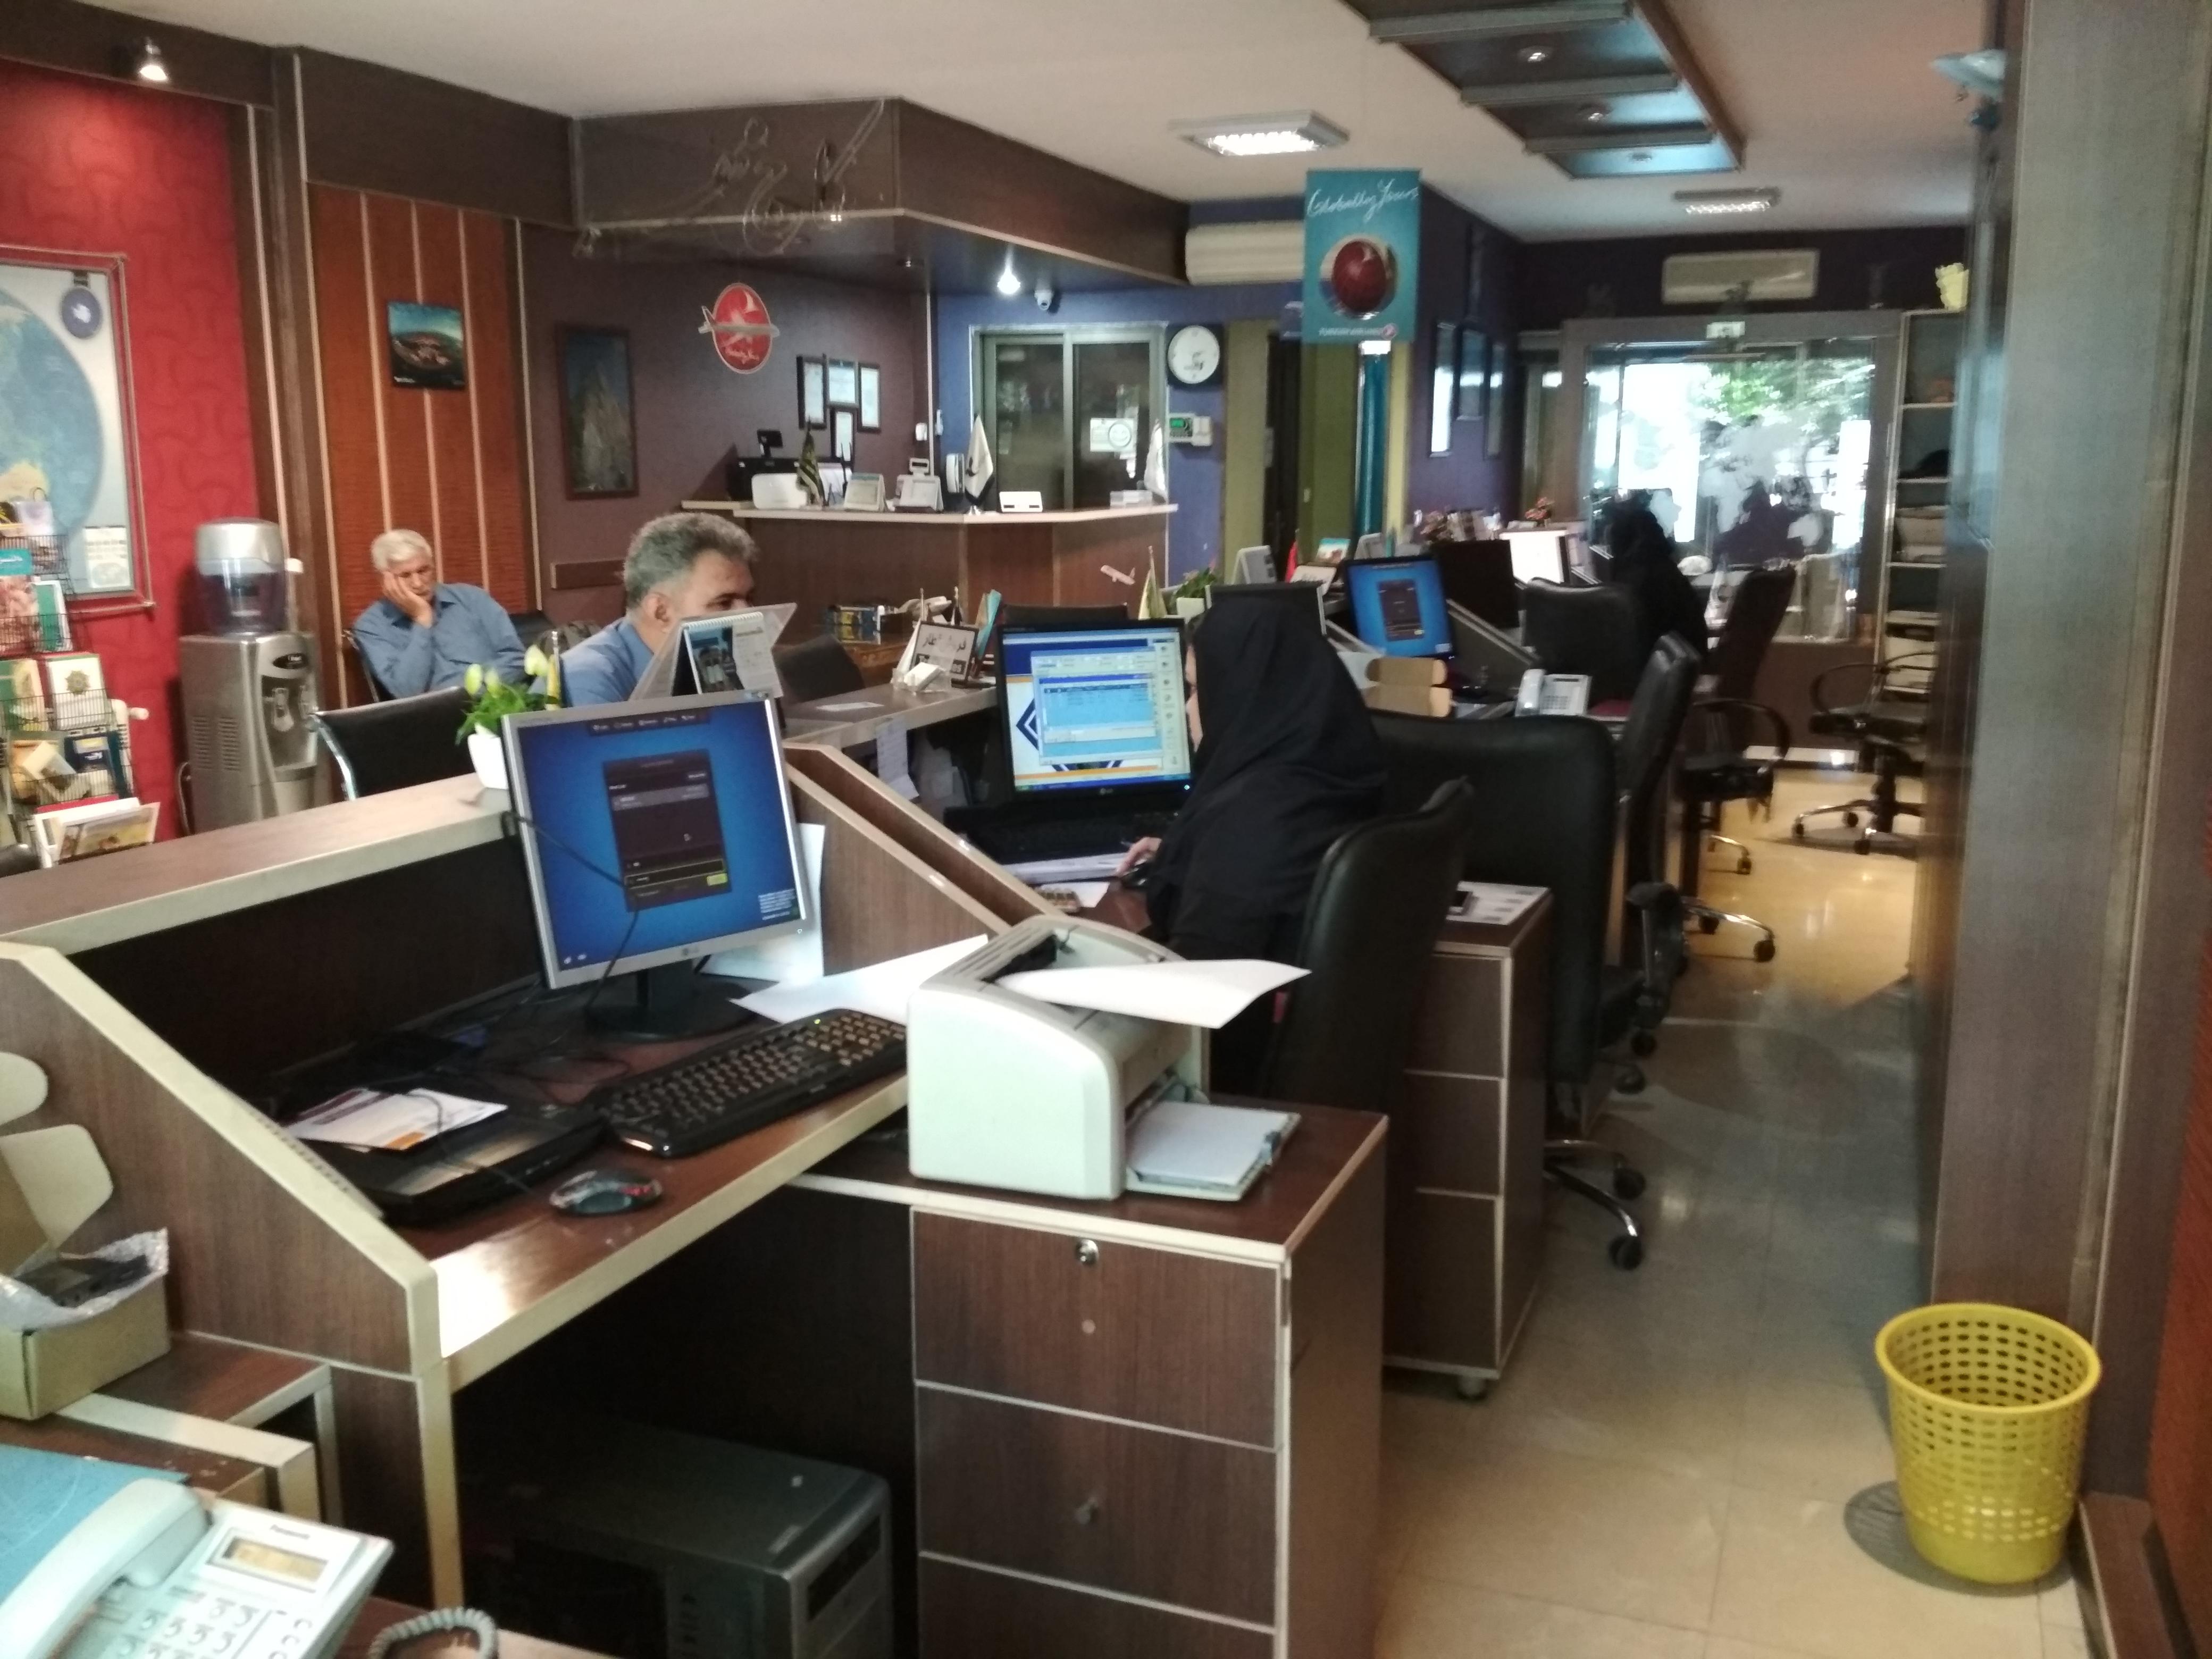 Kadj-Mehr-Travel-Agency-in-Iran1